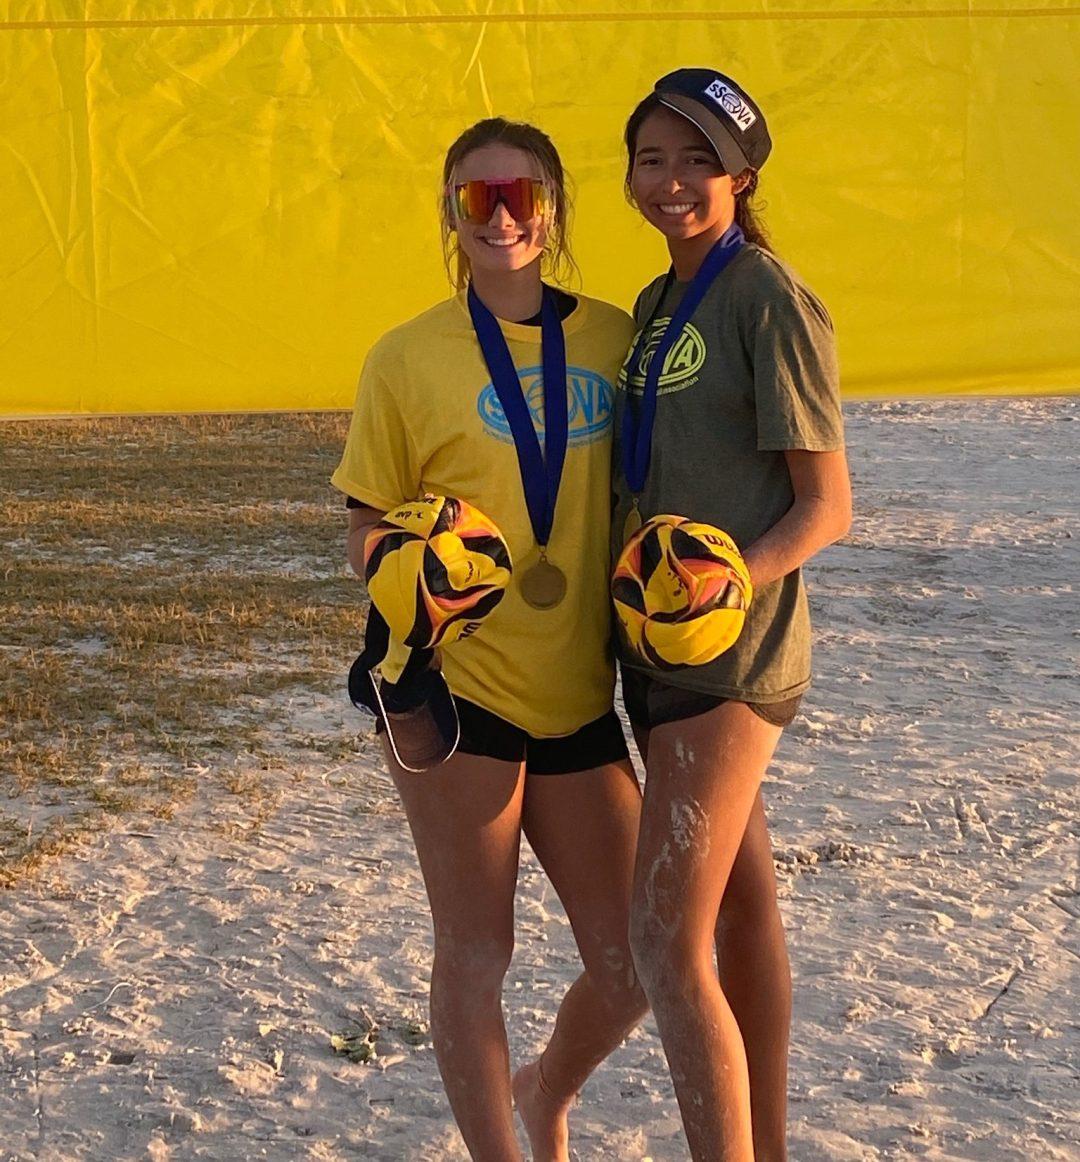 SSOVA Gold Winners - Kailey and Mia